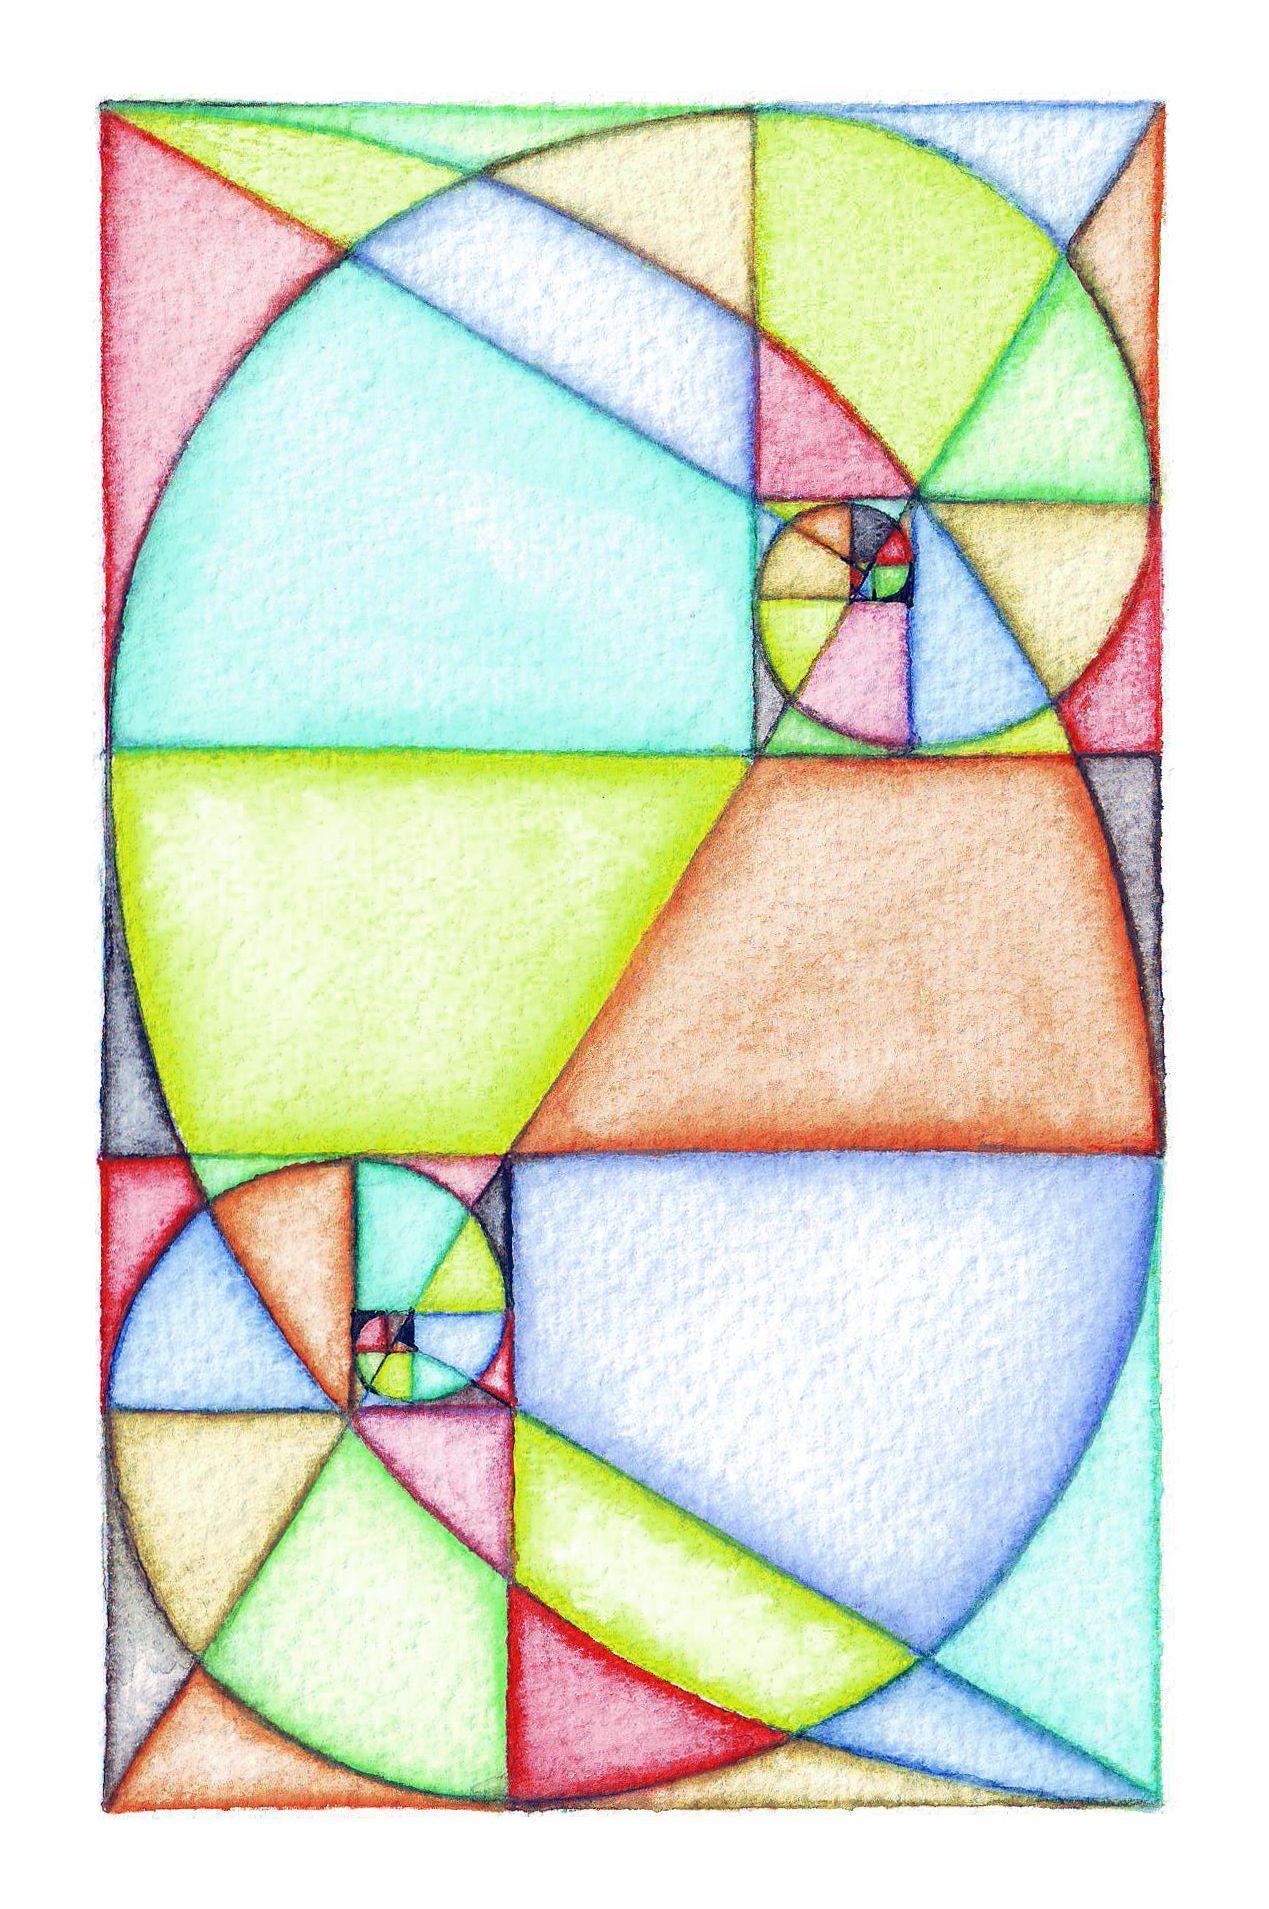 fibonacci spiral art #deviantART (With images)   Spiral ...